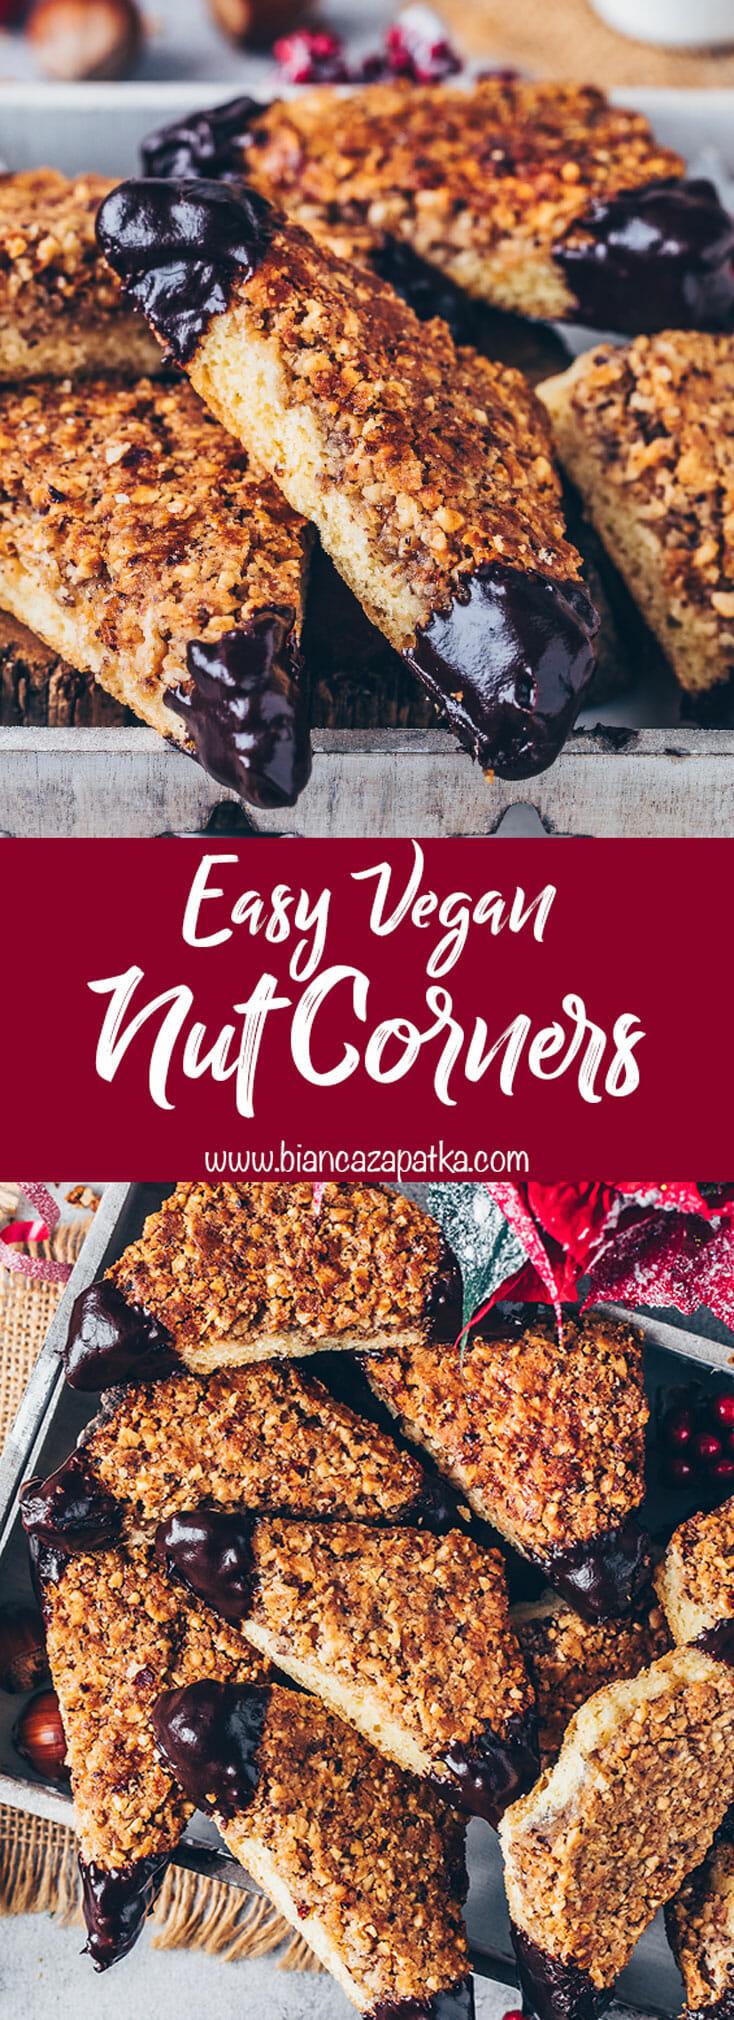 Nut Bars (Vegan Cookie Crunch Corners)